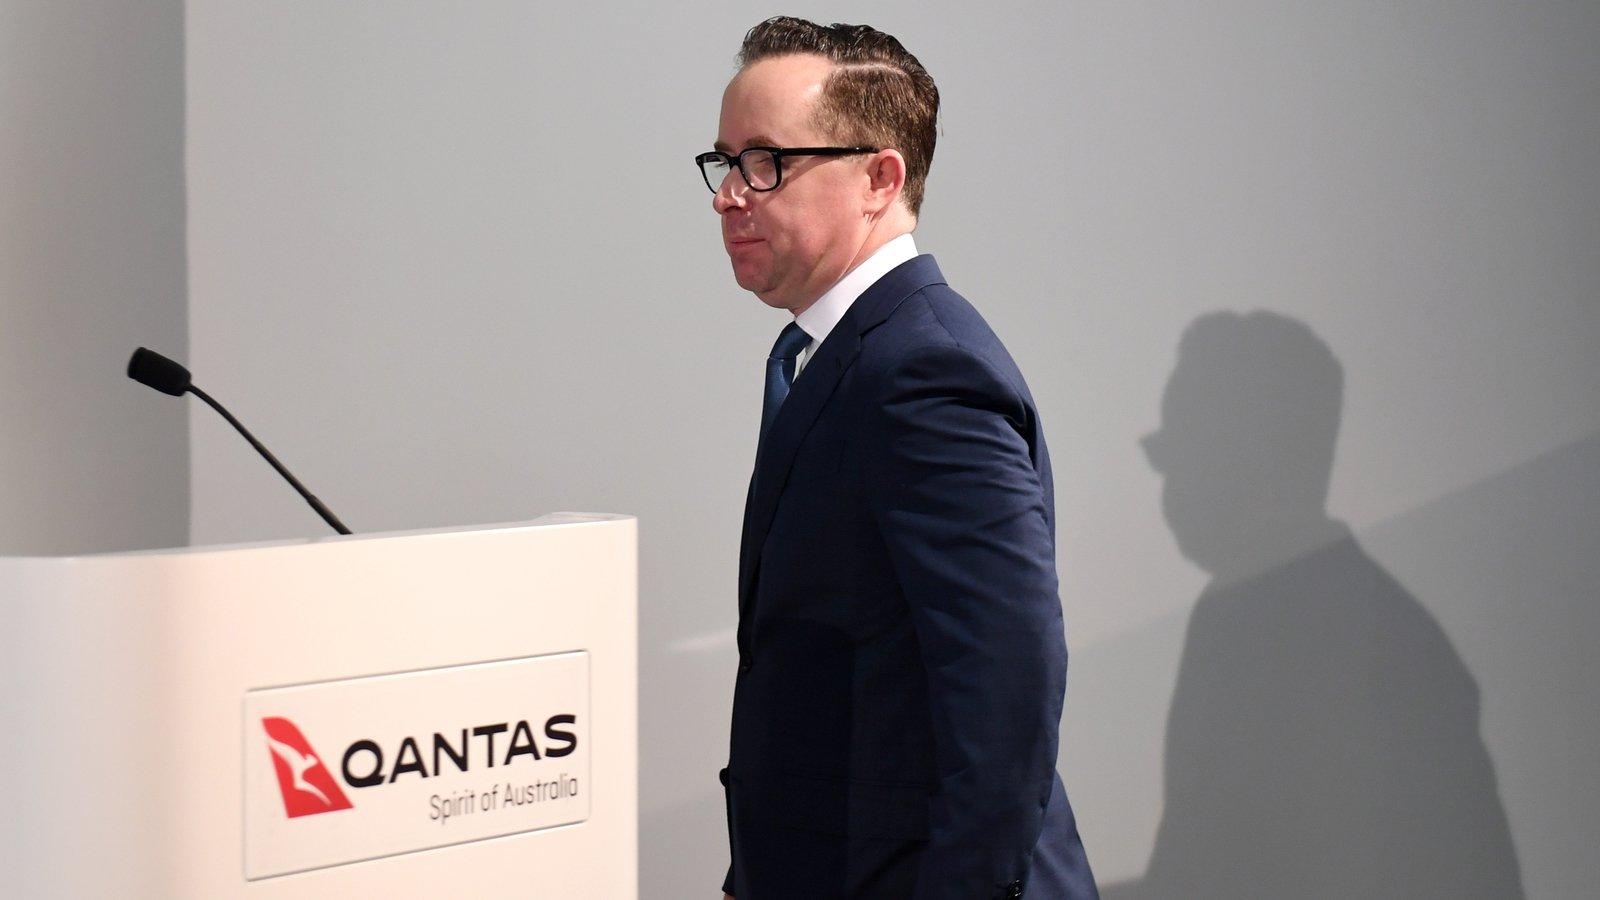 Qantas sees domestic leisure travel at pre-Covid levels